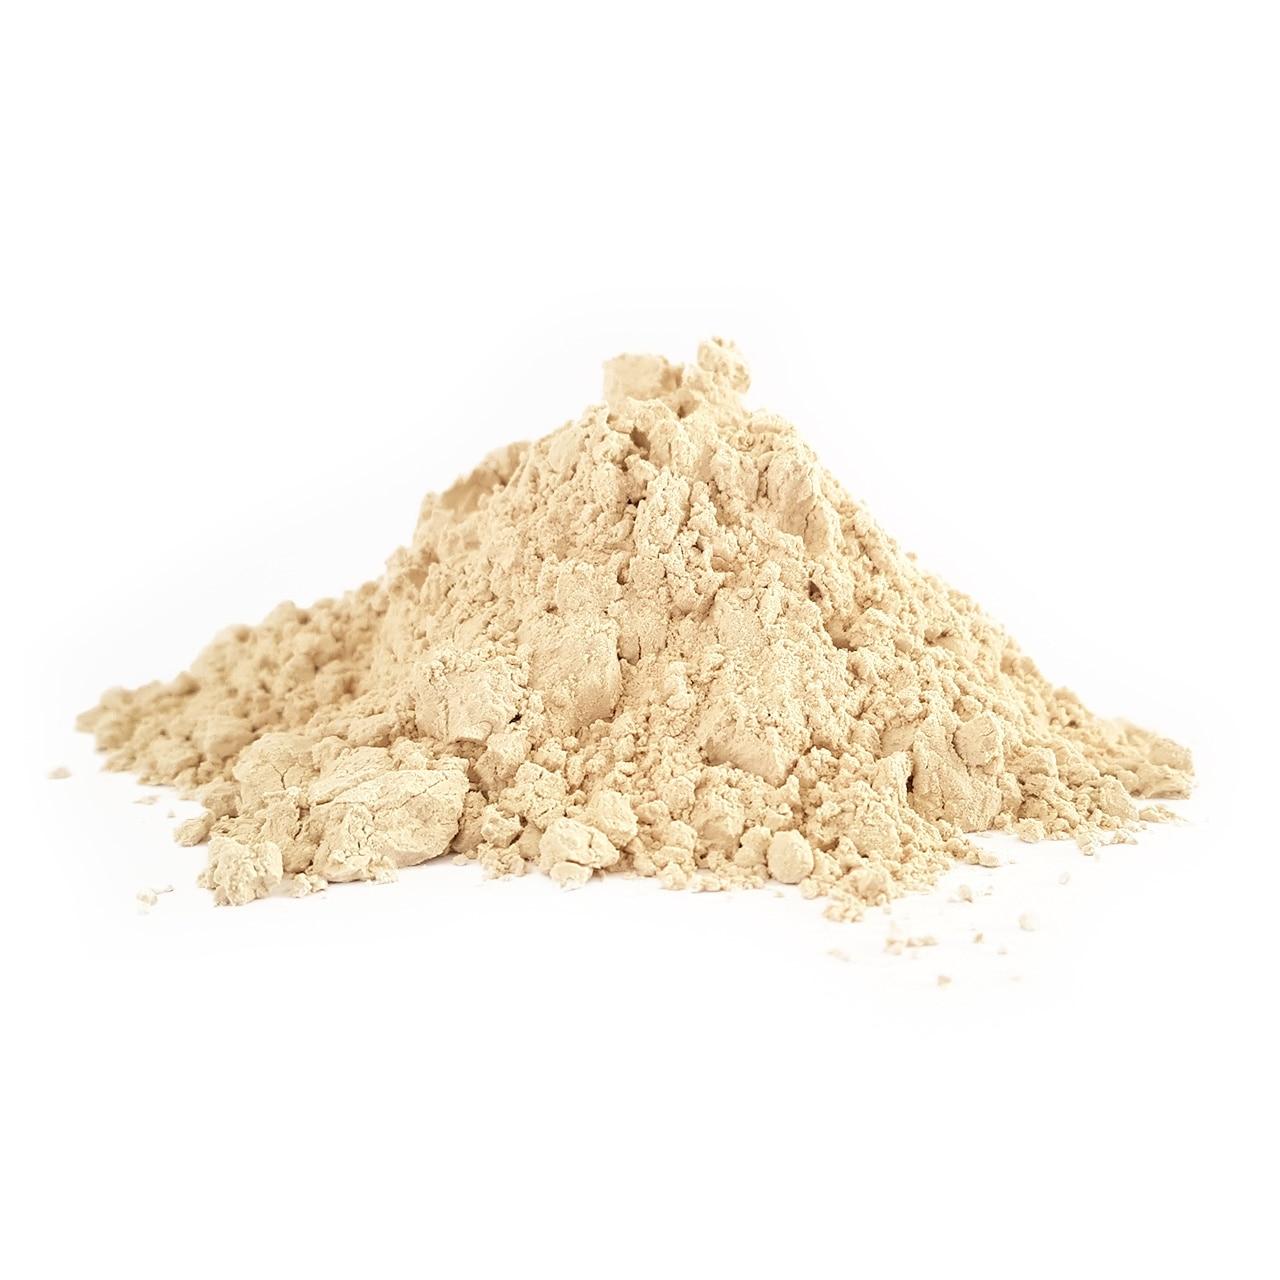 Organic Bentonite Clay | Aromatherapy Tools & Supplies